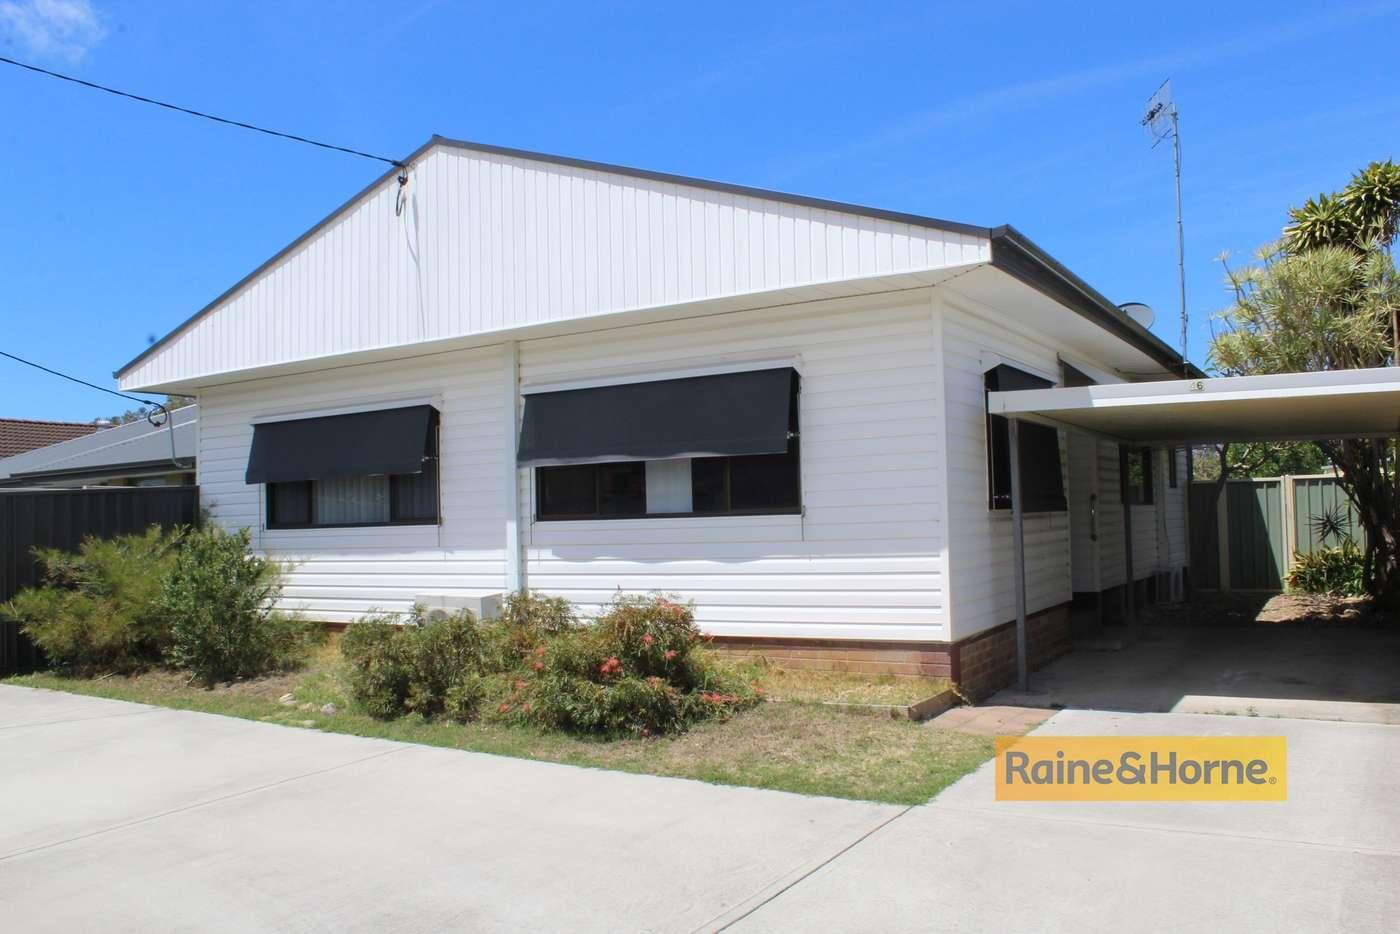 Main view of Homely house listing, 46 Ridge Street, Ettalong Beach NSW 2257